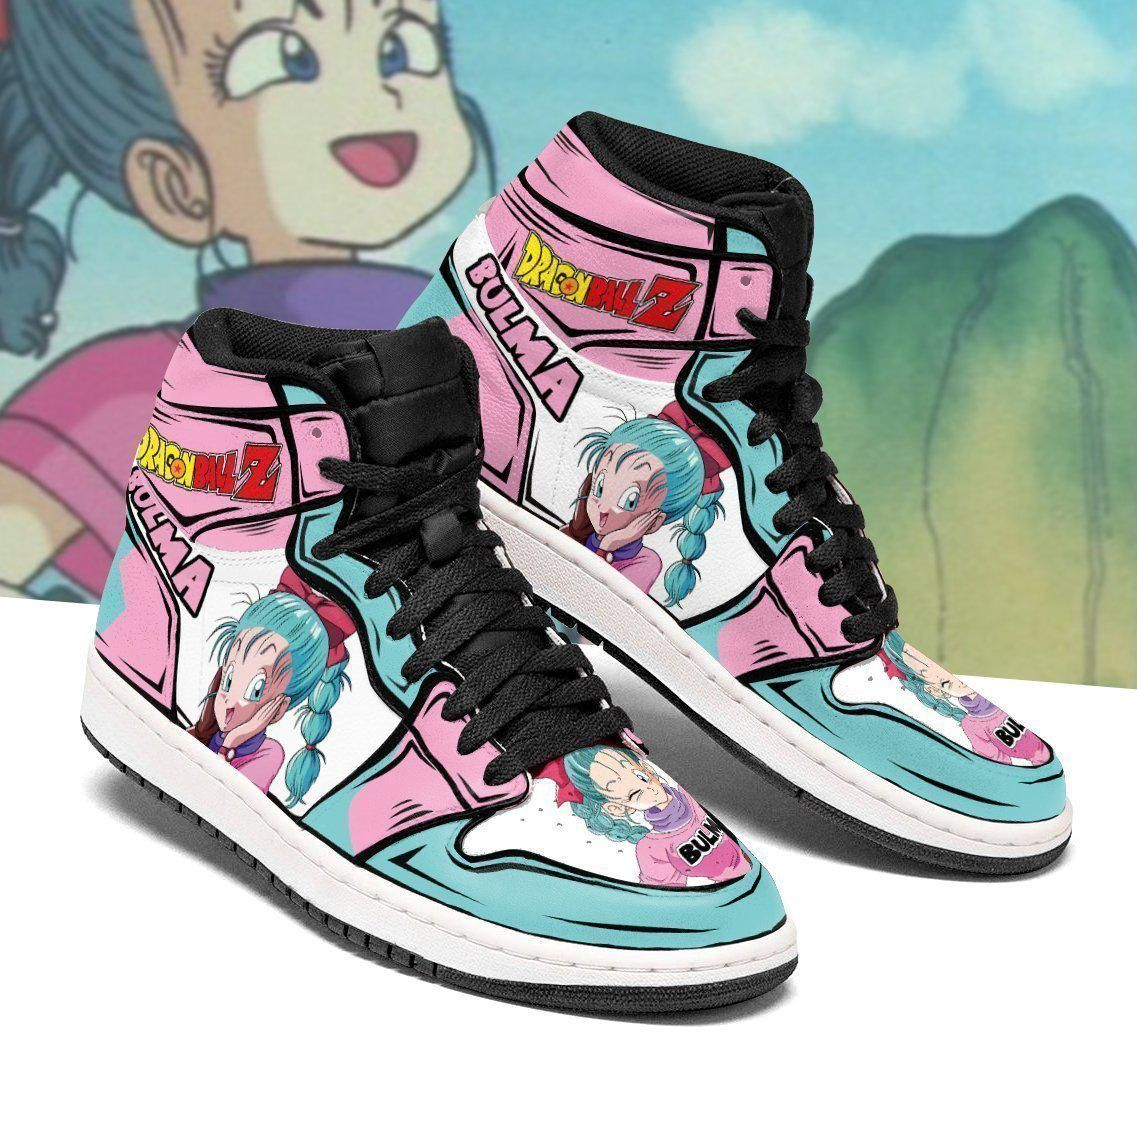 DBZ Bulma Sneakers Custom Anime Dragon Ball Z Shoes GO1210